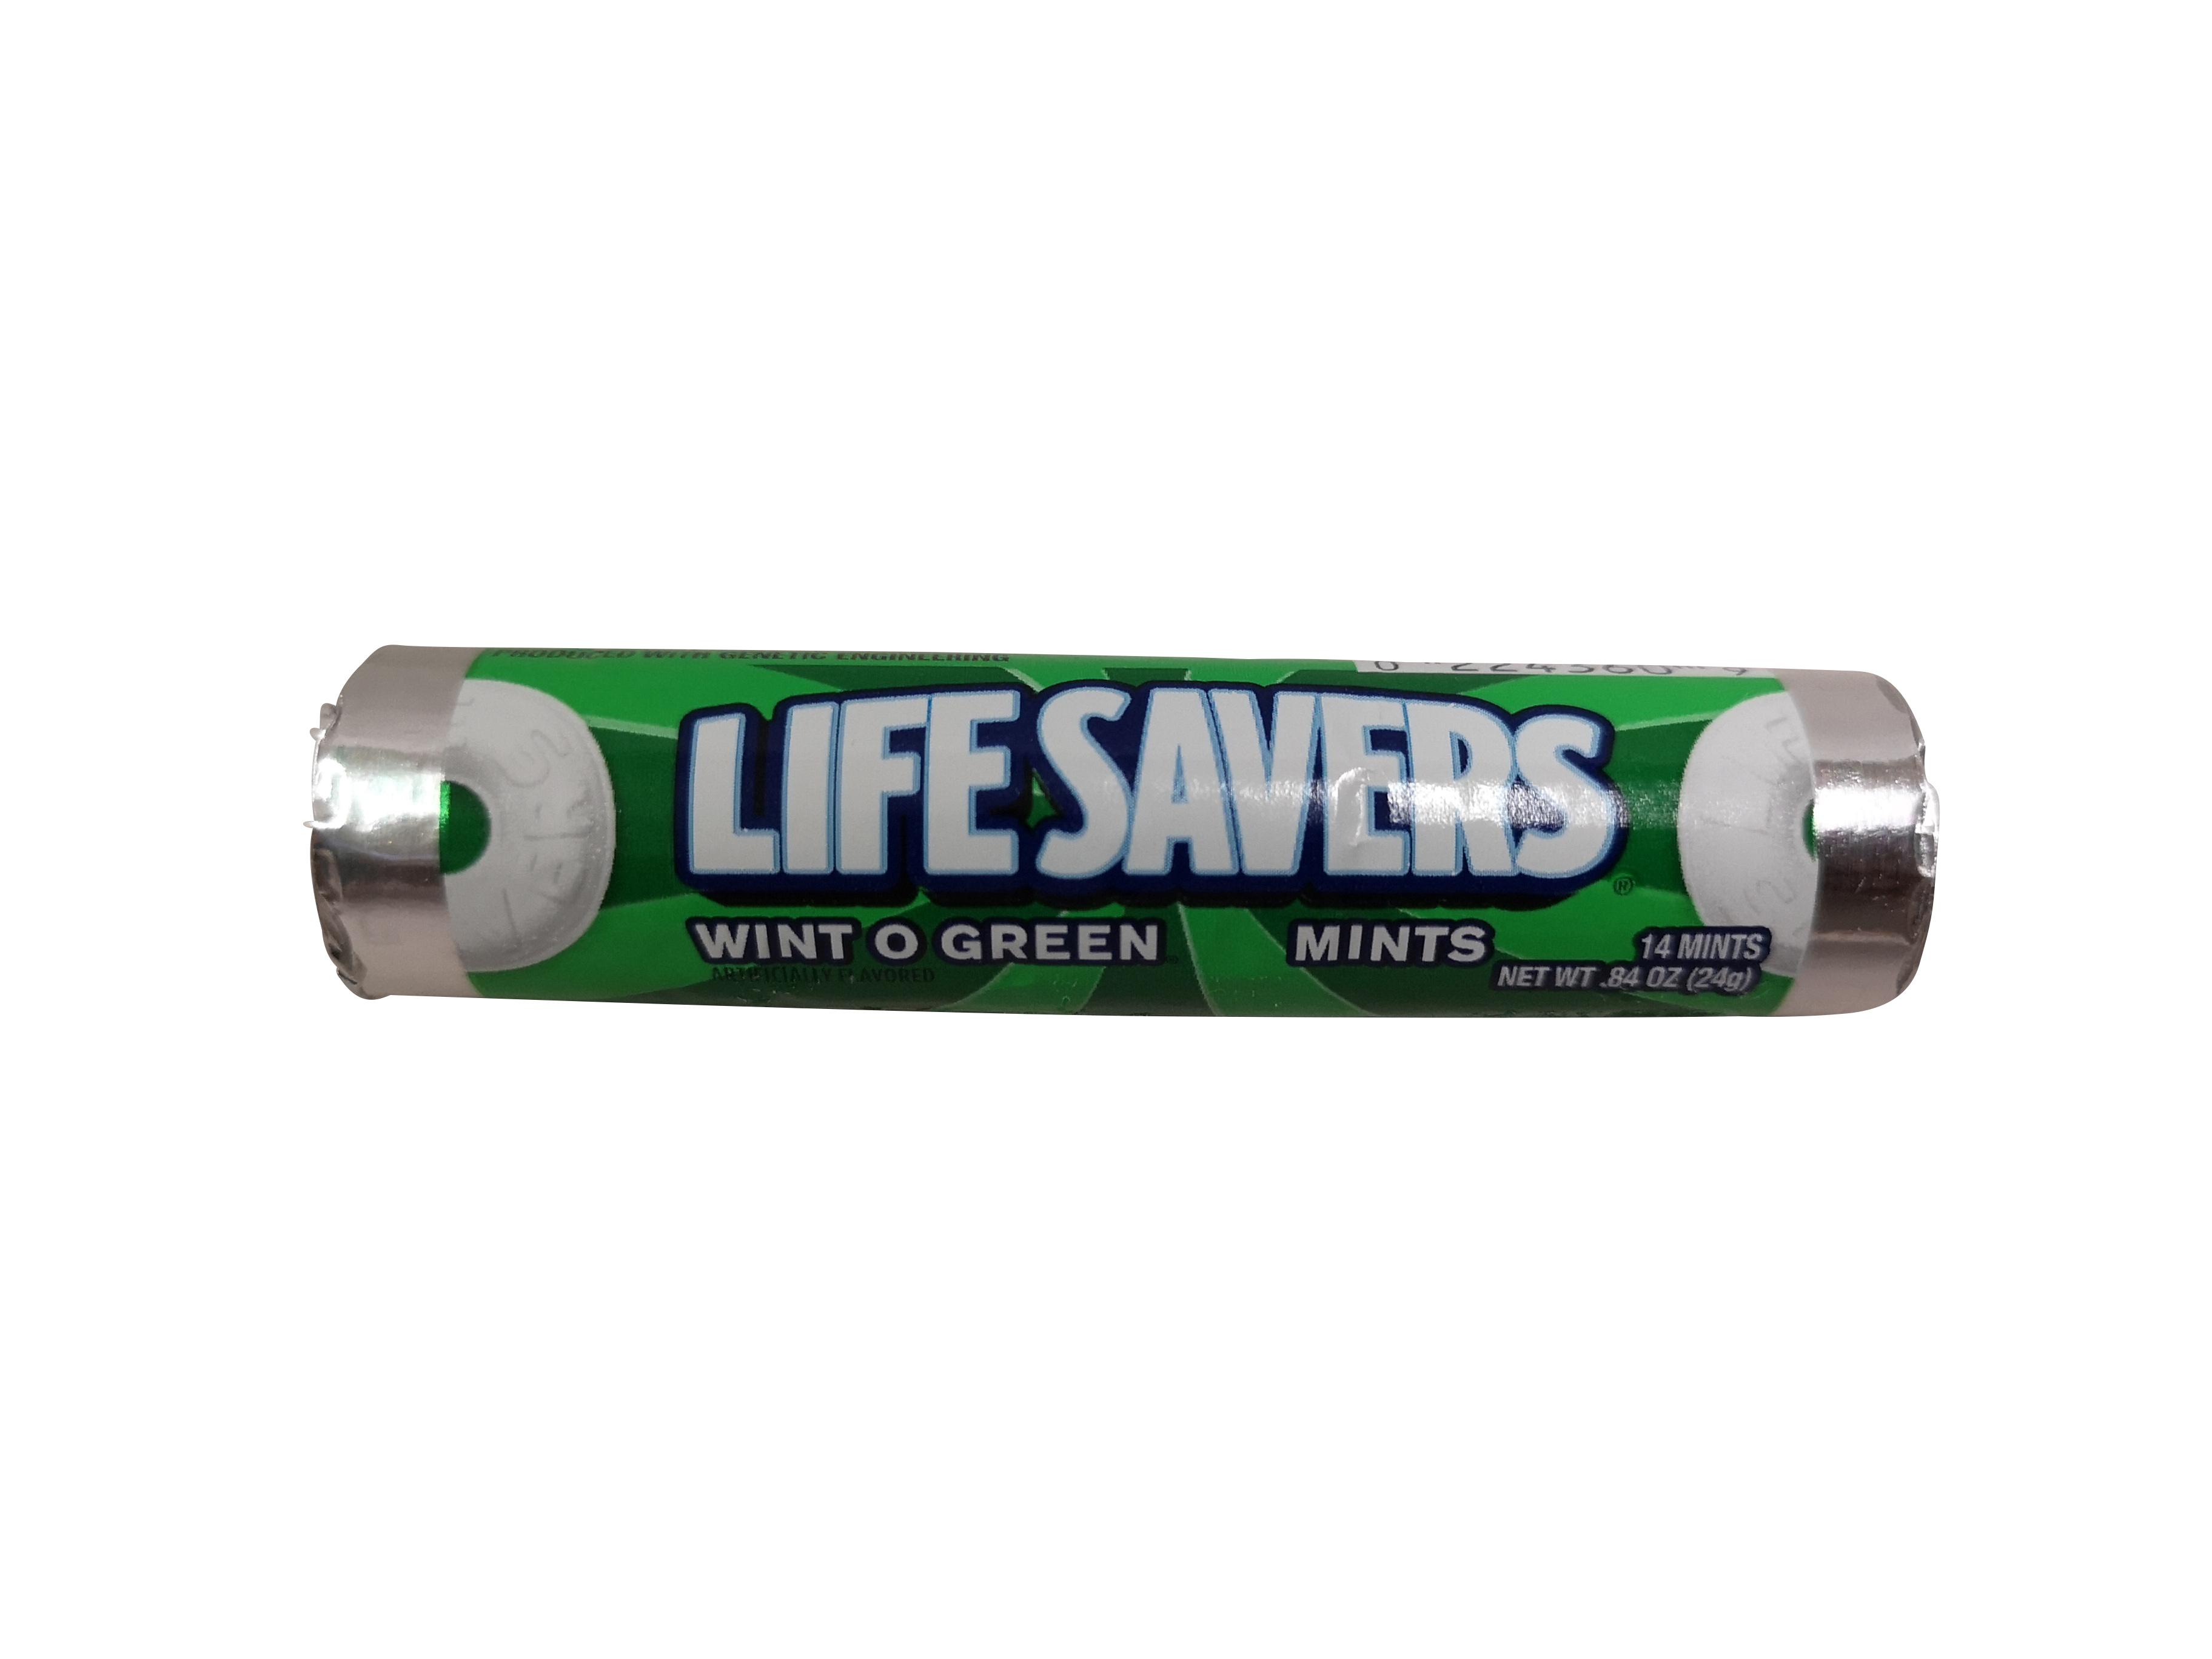 Life Savers Wint O Green